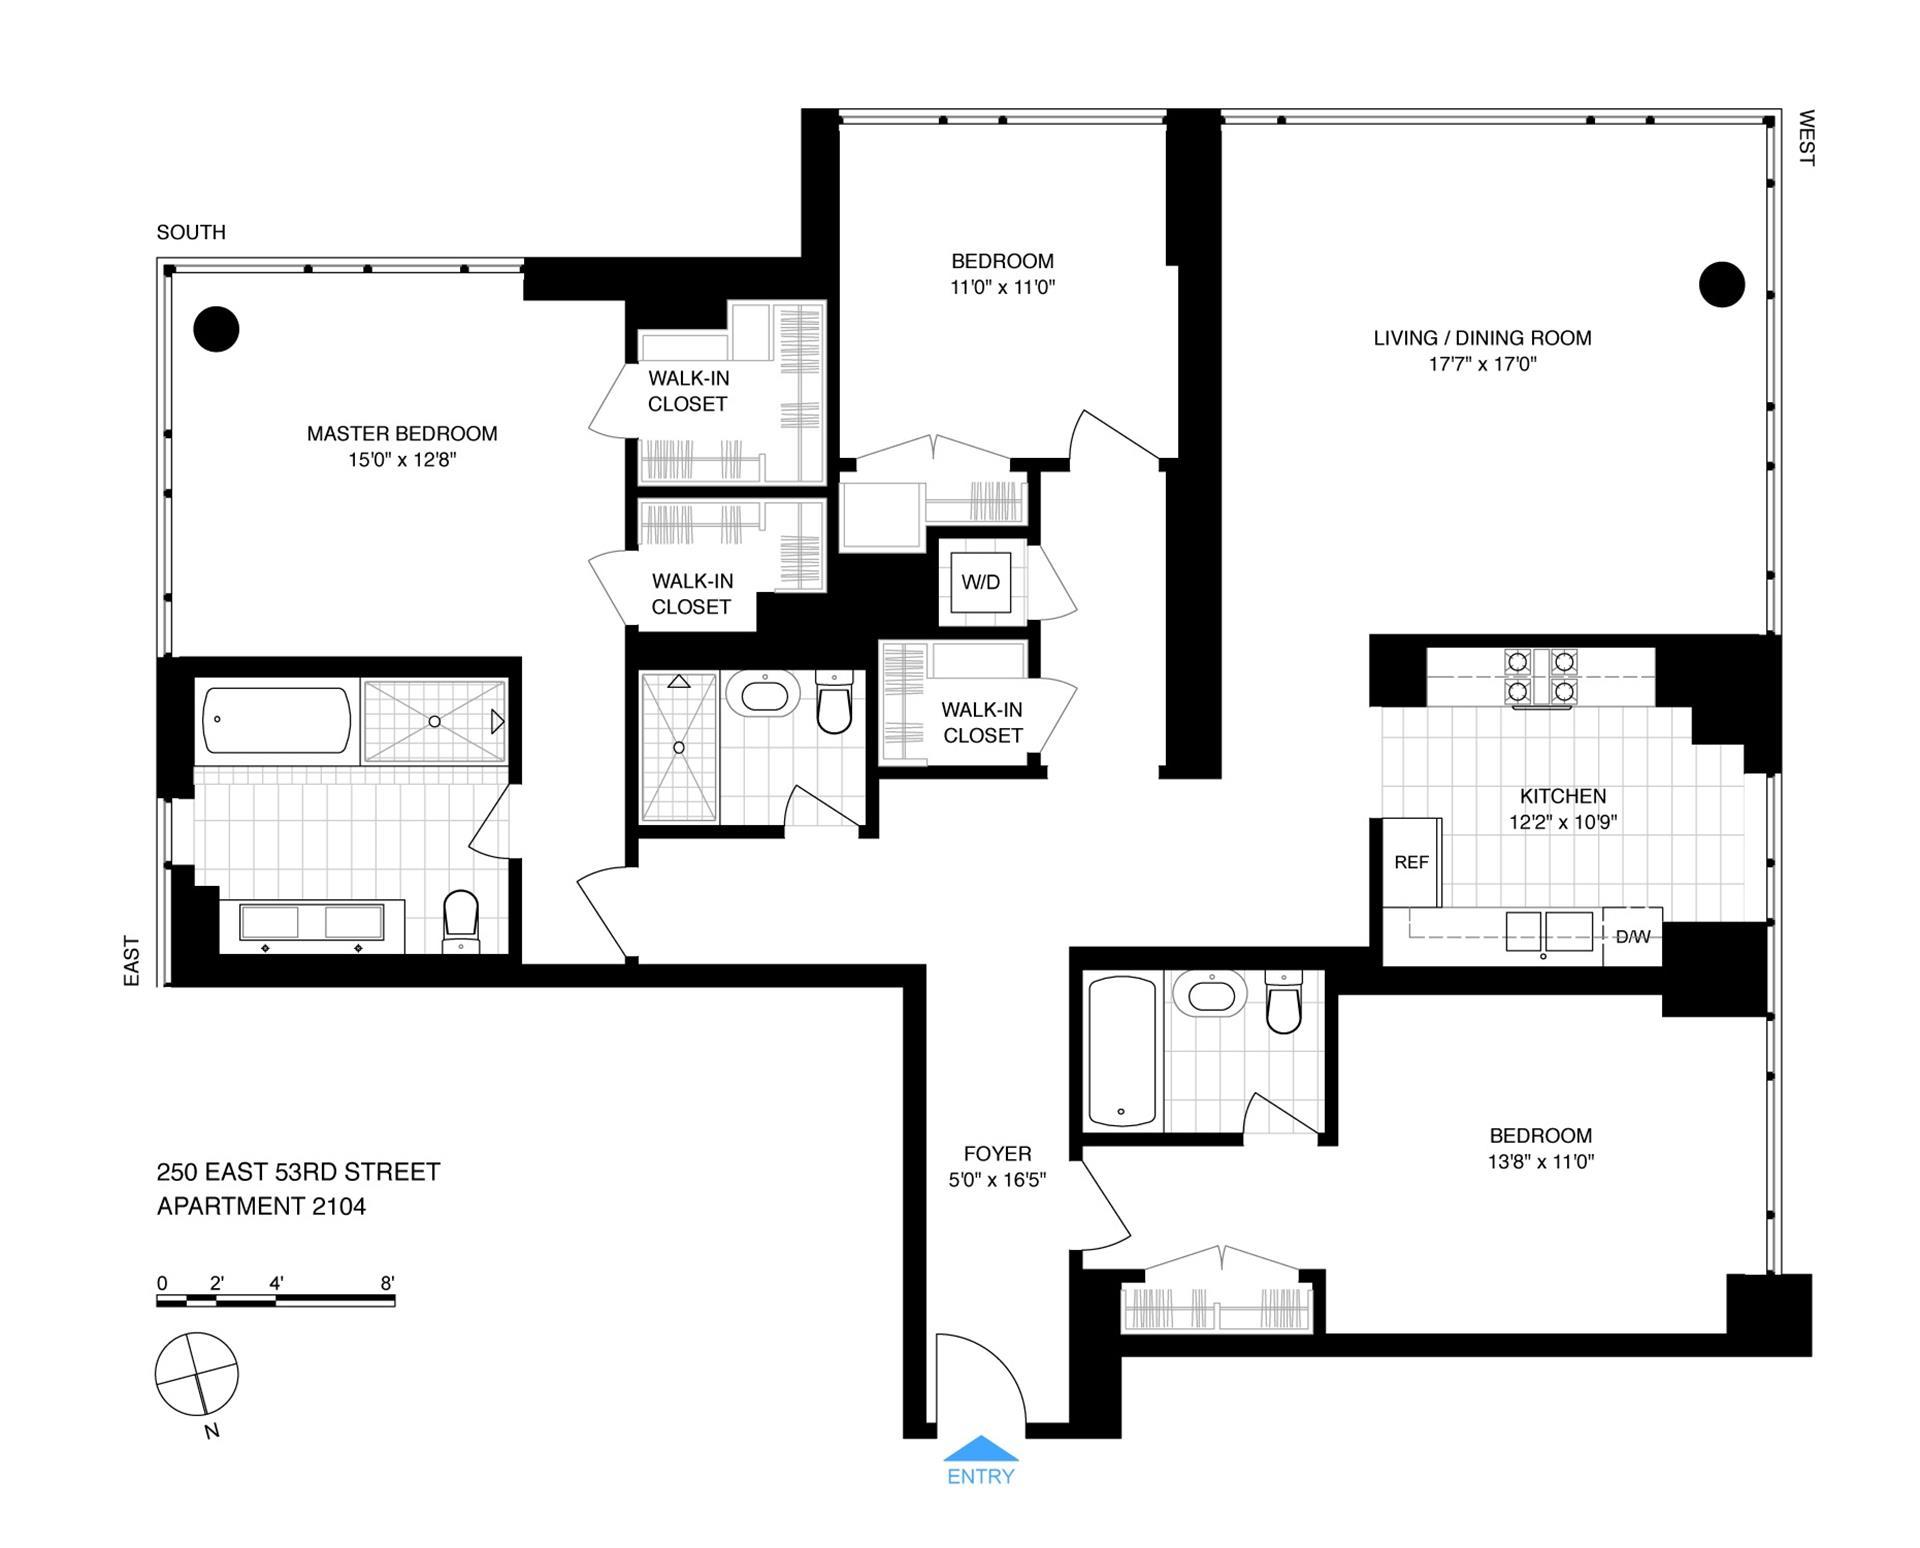 Floor plan of The Veneto, 250 East 53rd St, 2104 - Midtown, New York